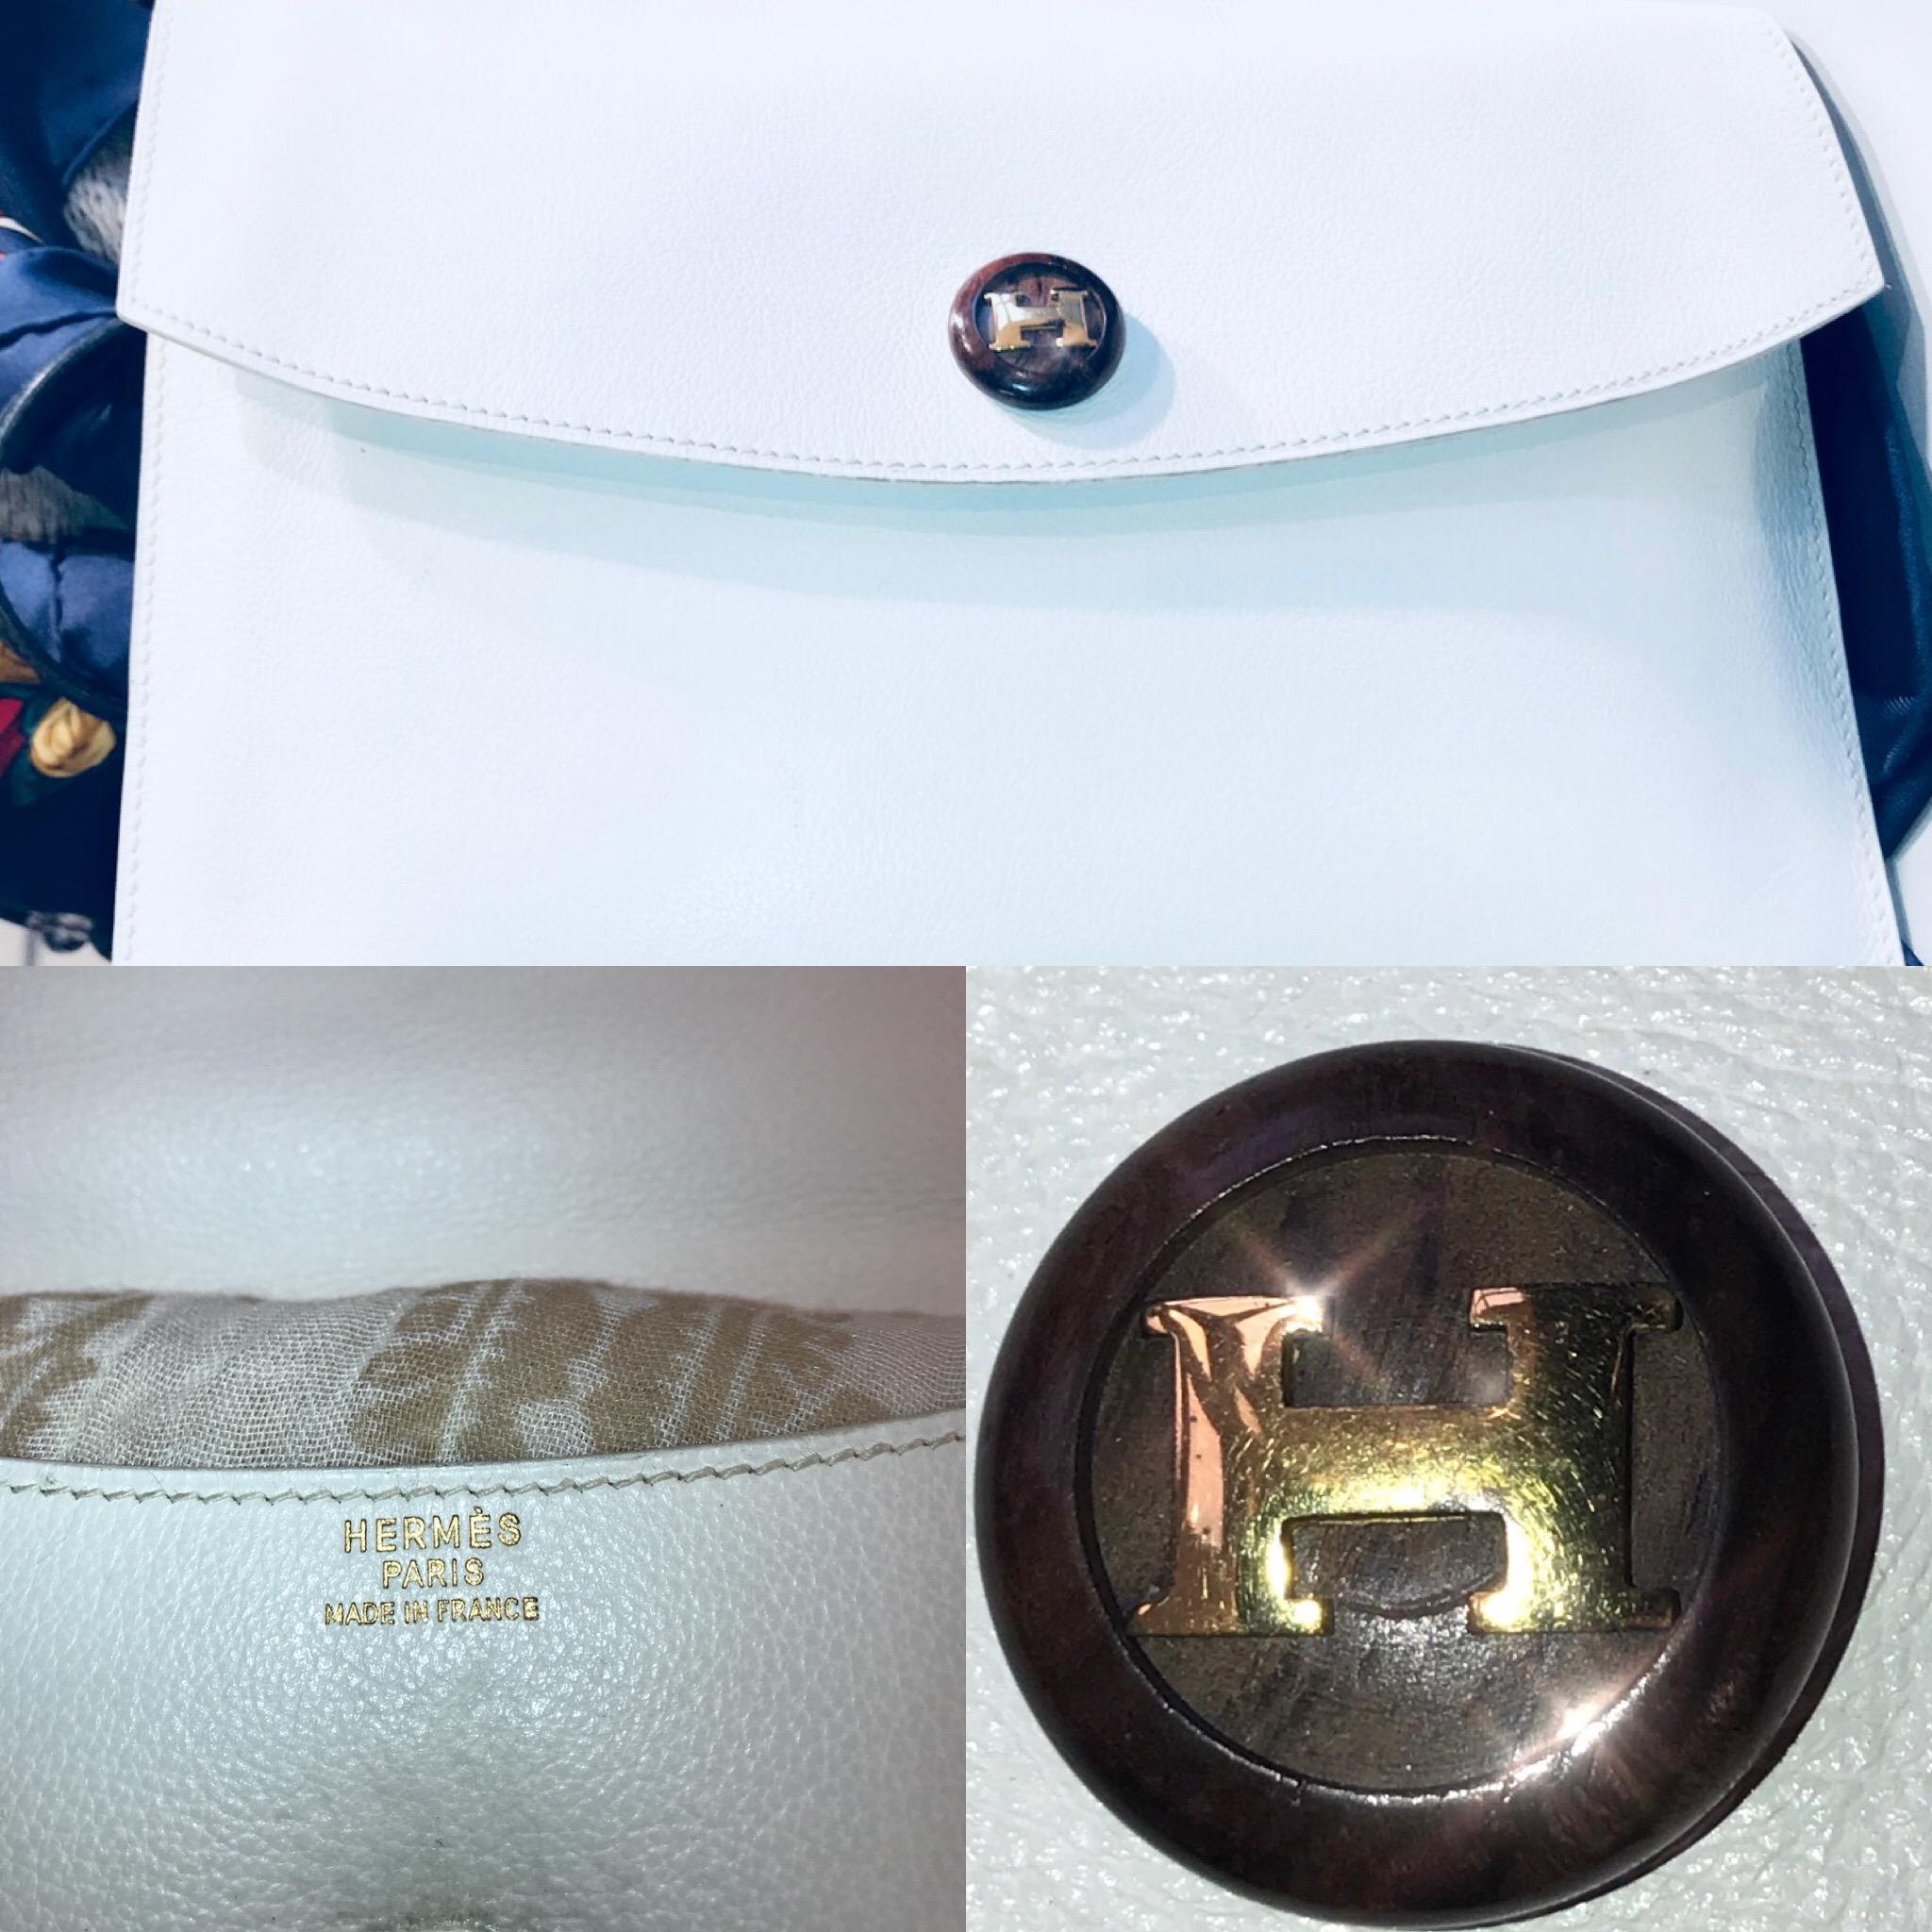 Hermes white leather vintage clutch £199.JPG